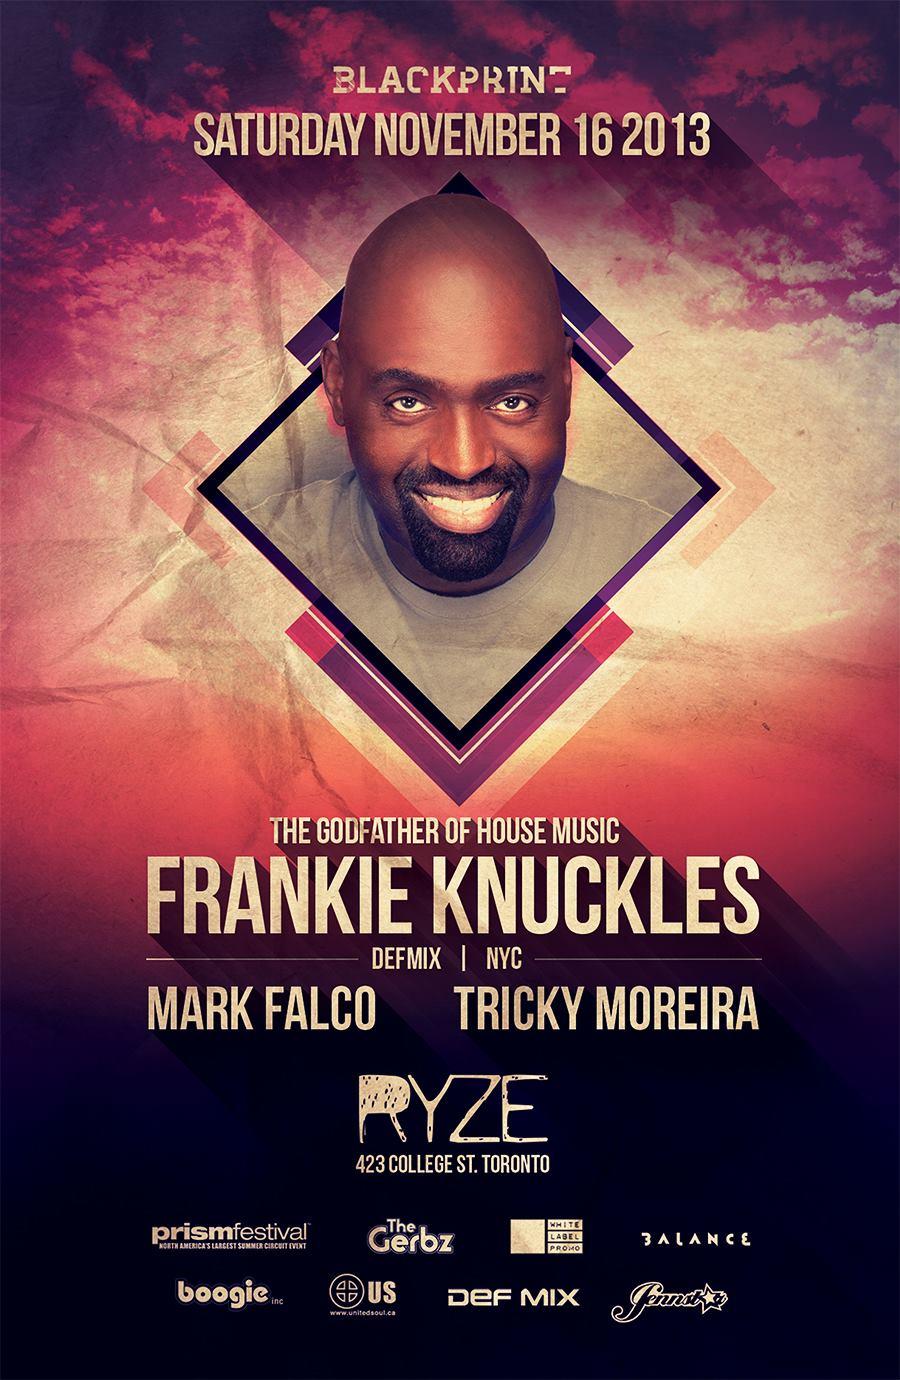 Frankie Knuckles, Mark Falco, Tricky Moreira Ryze Toronto